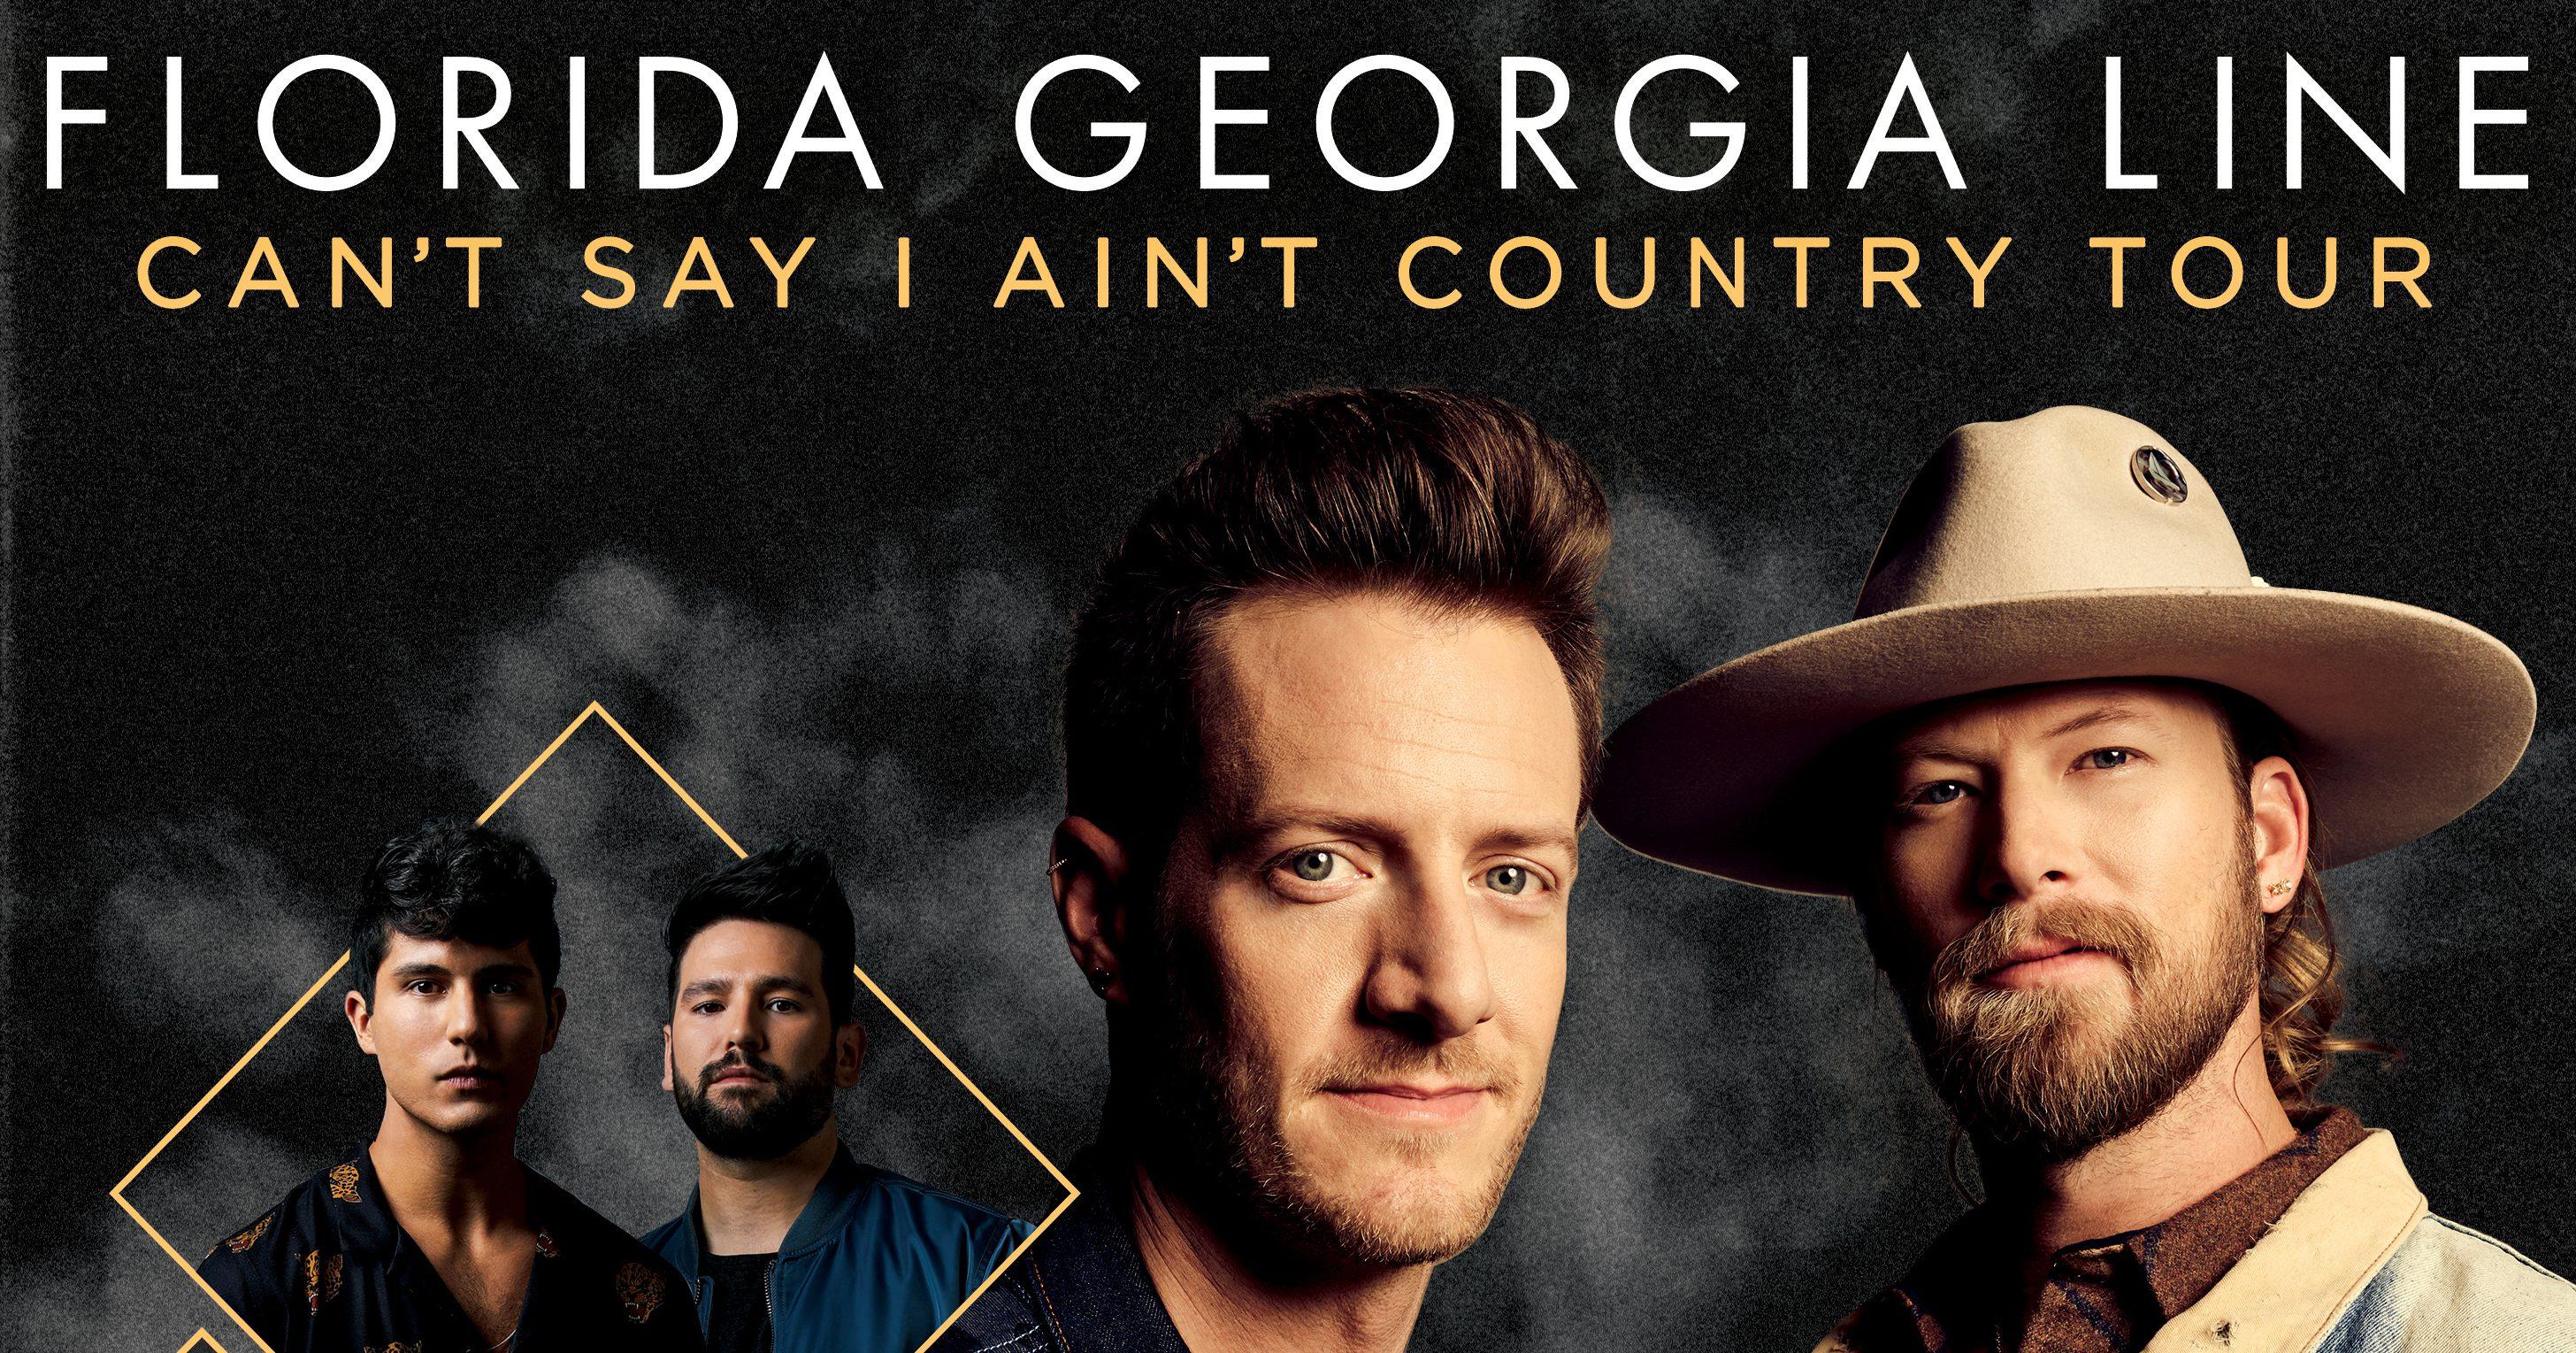 Florida Georgia Line Announces Cant Say I Aint Country